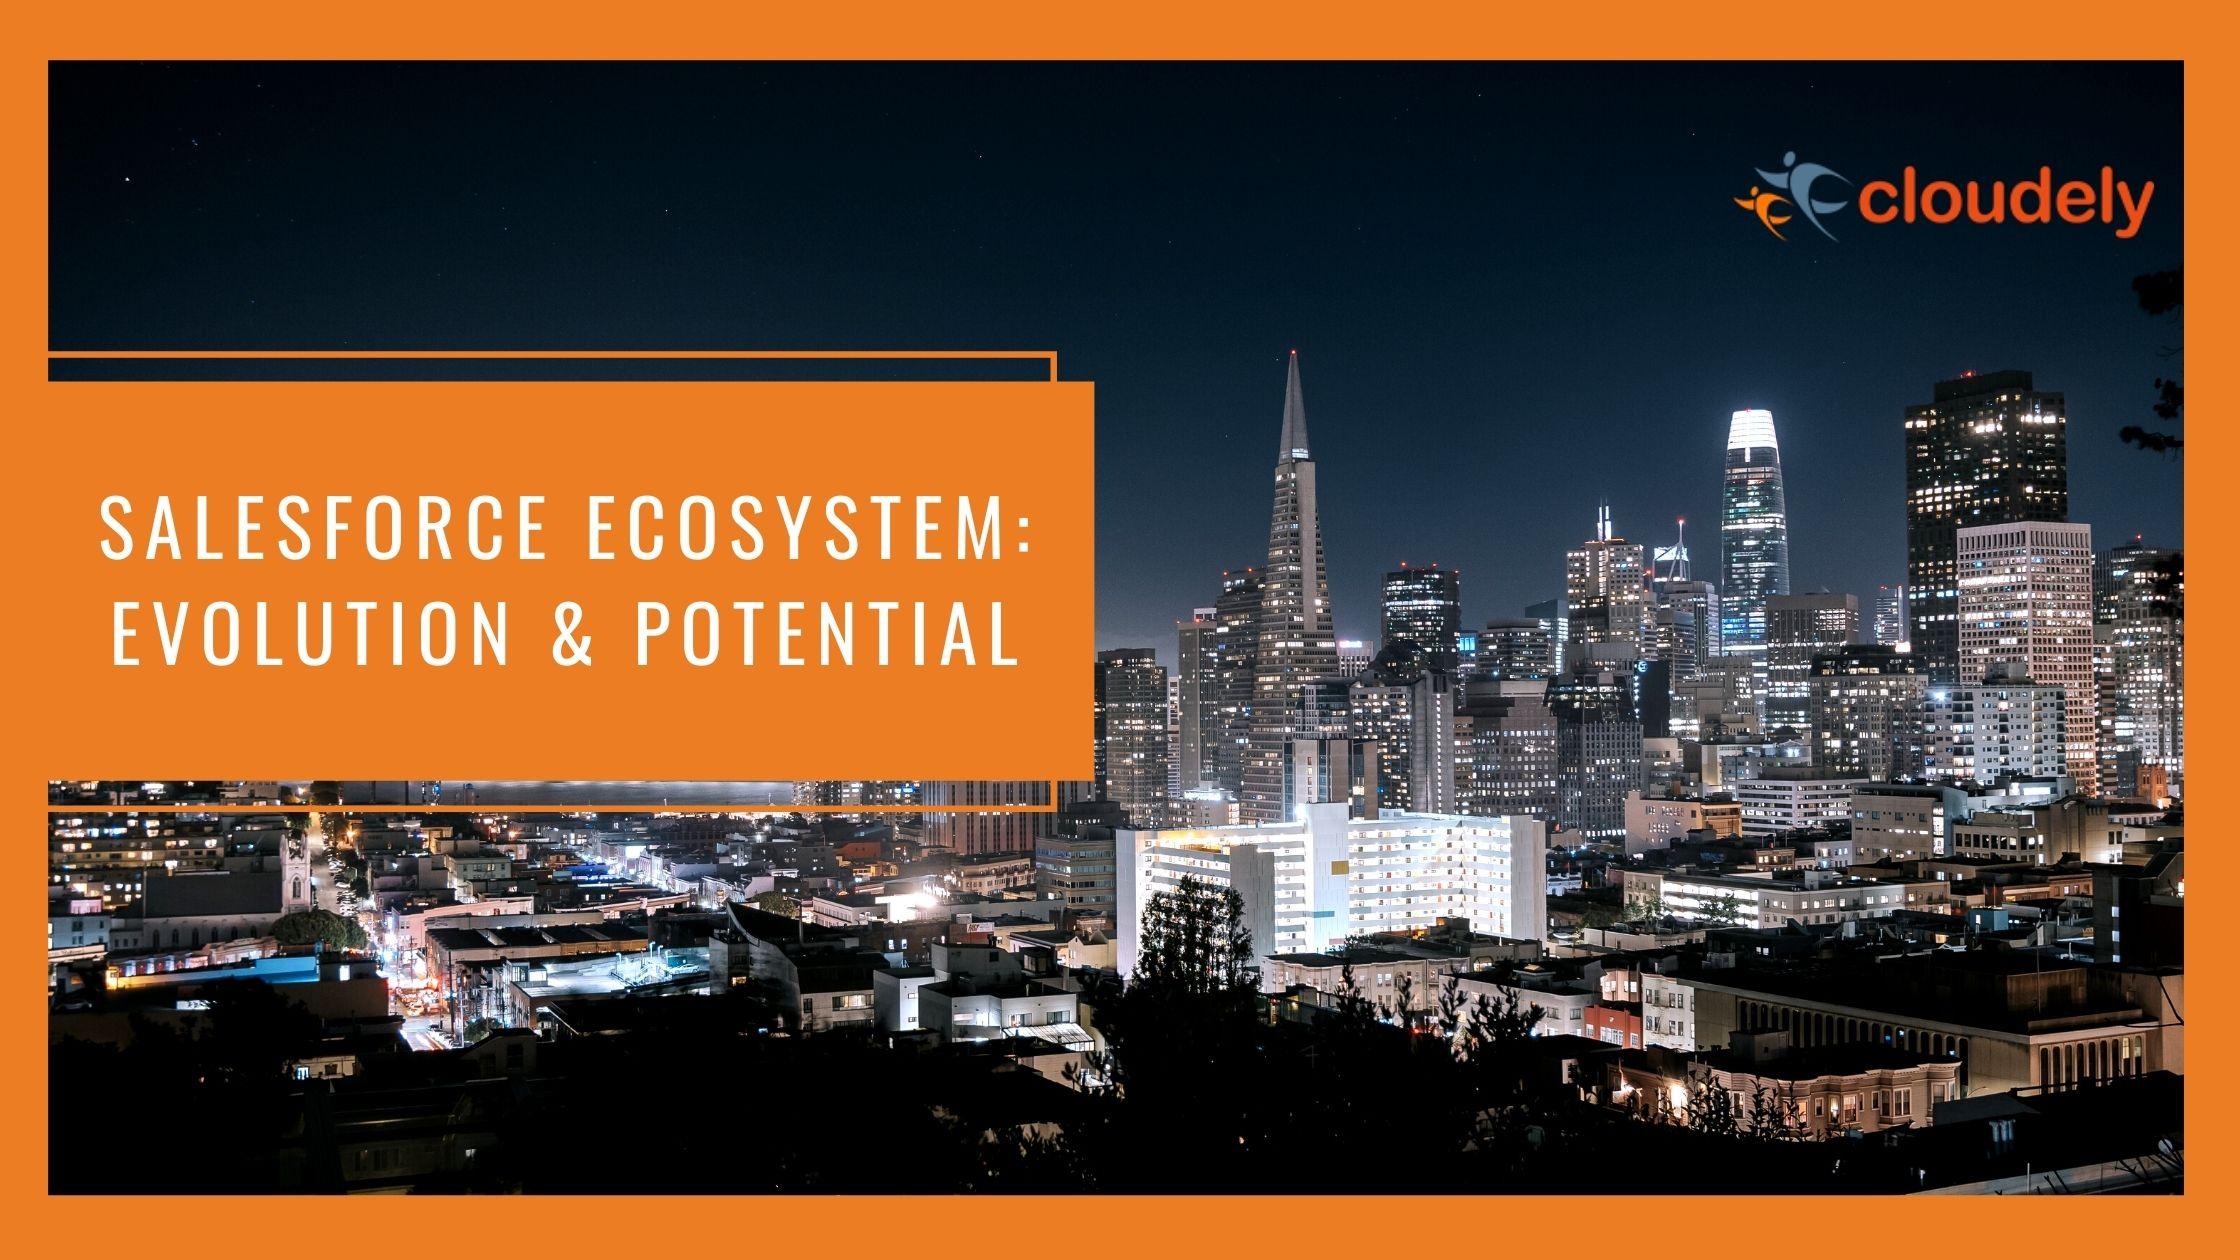 Salesforce ecosystem